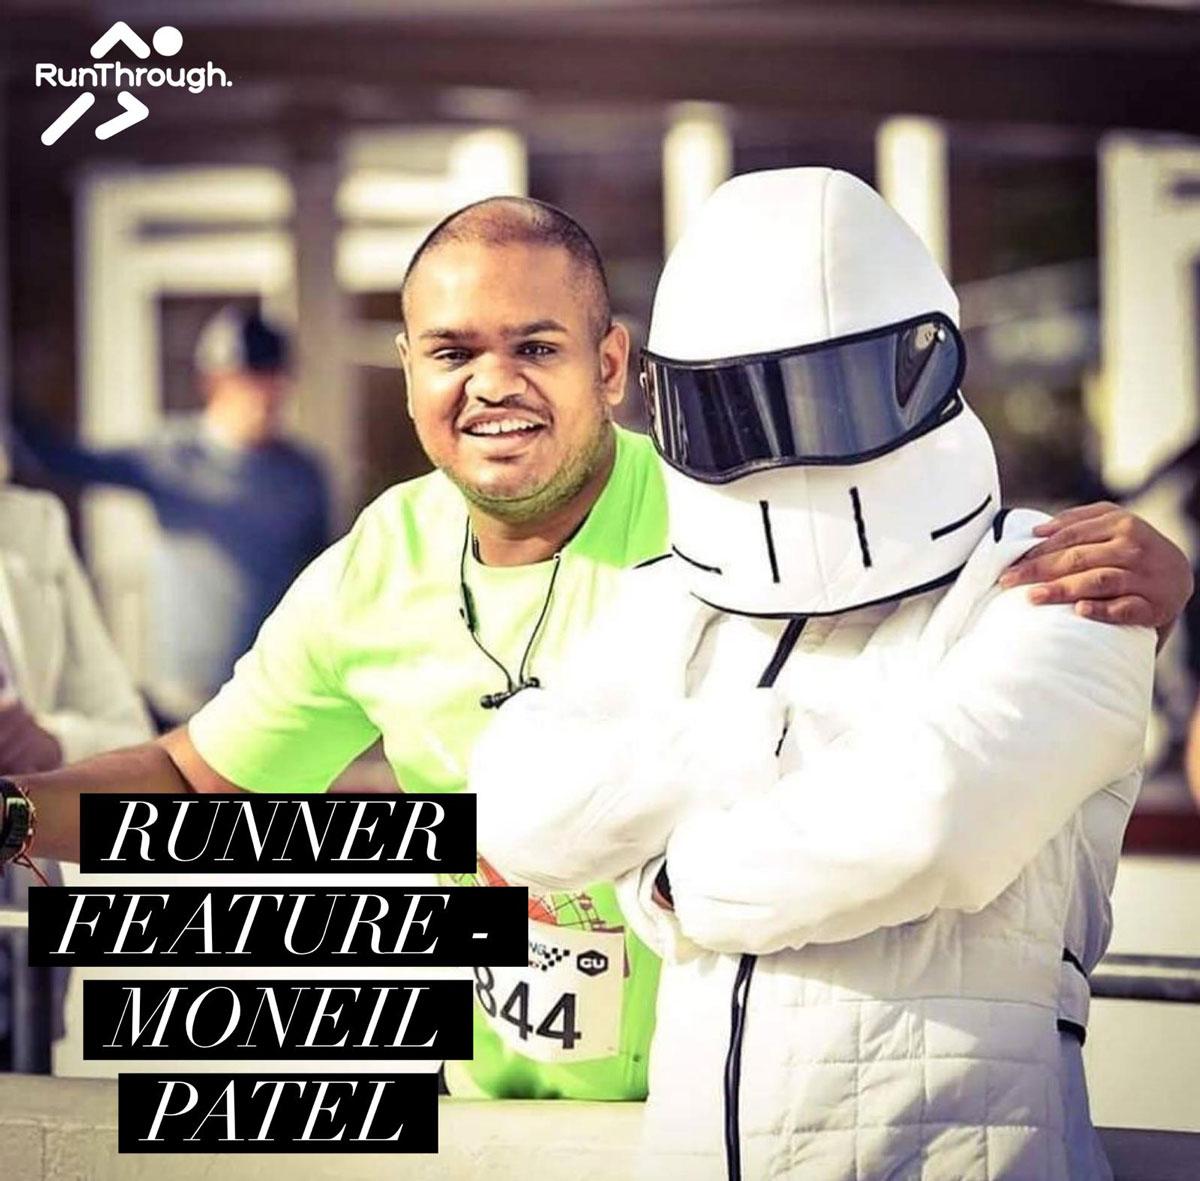 Runner Feature – Moneil Patel